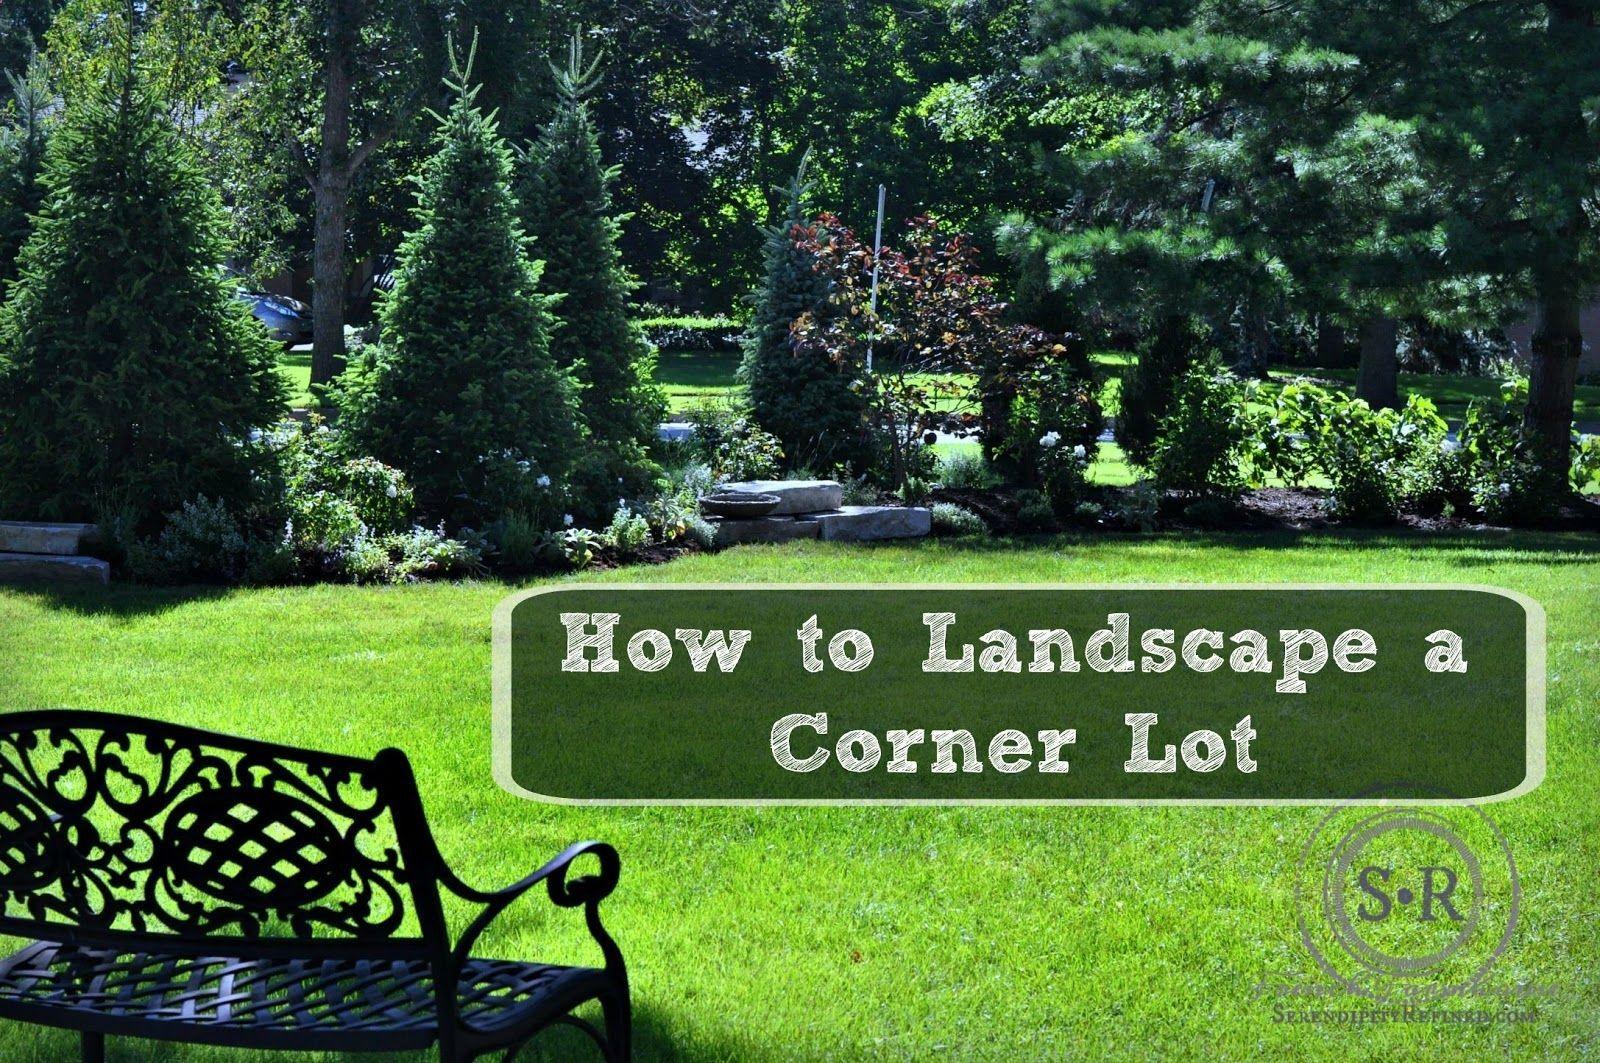 Garden landscape trees  Gardening  Landscaping Ideas for a Corner Lot  Serendipity